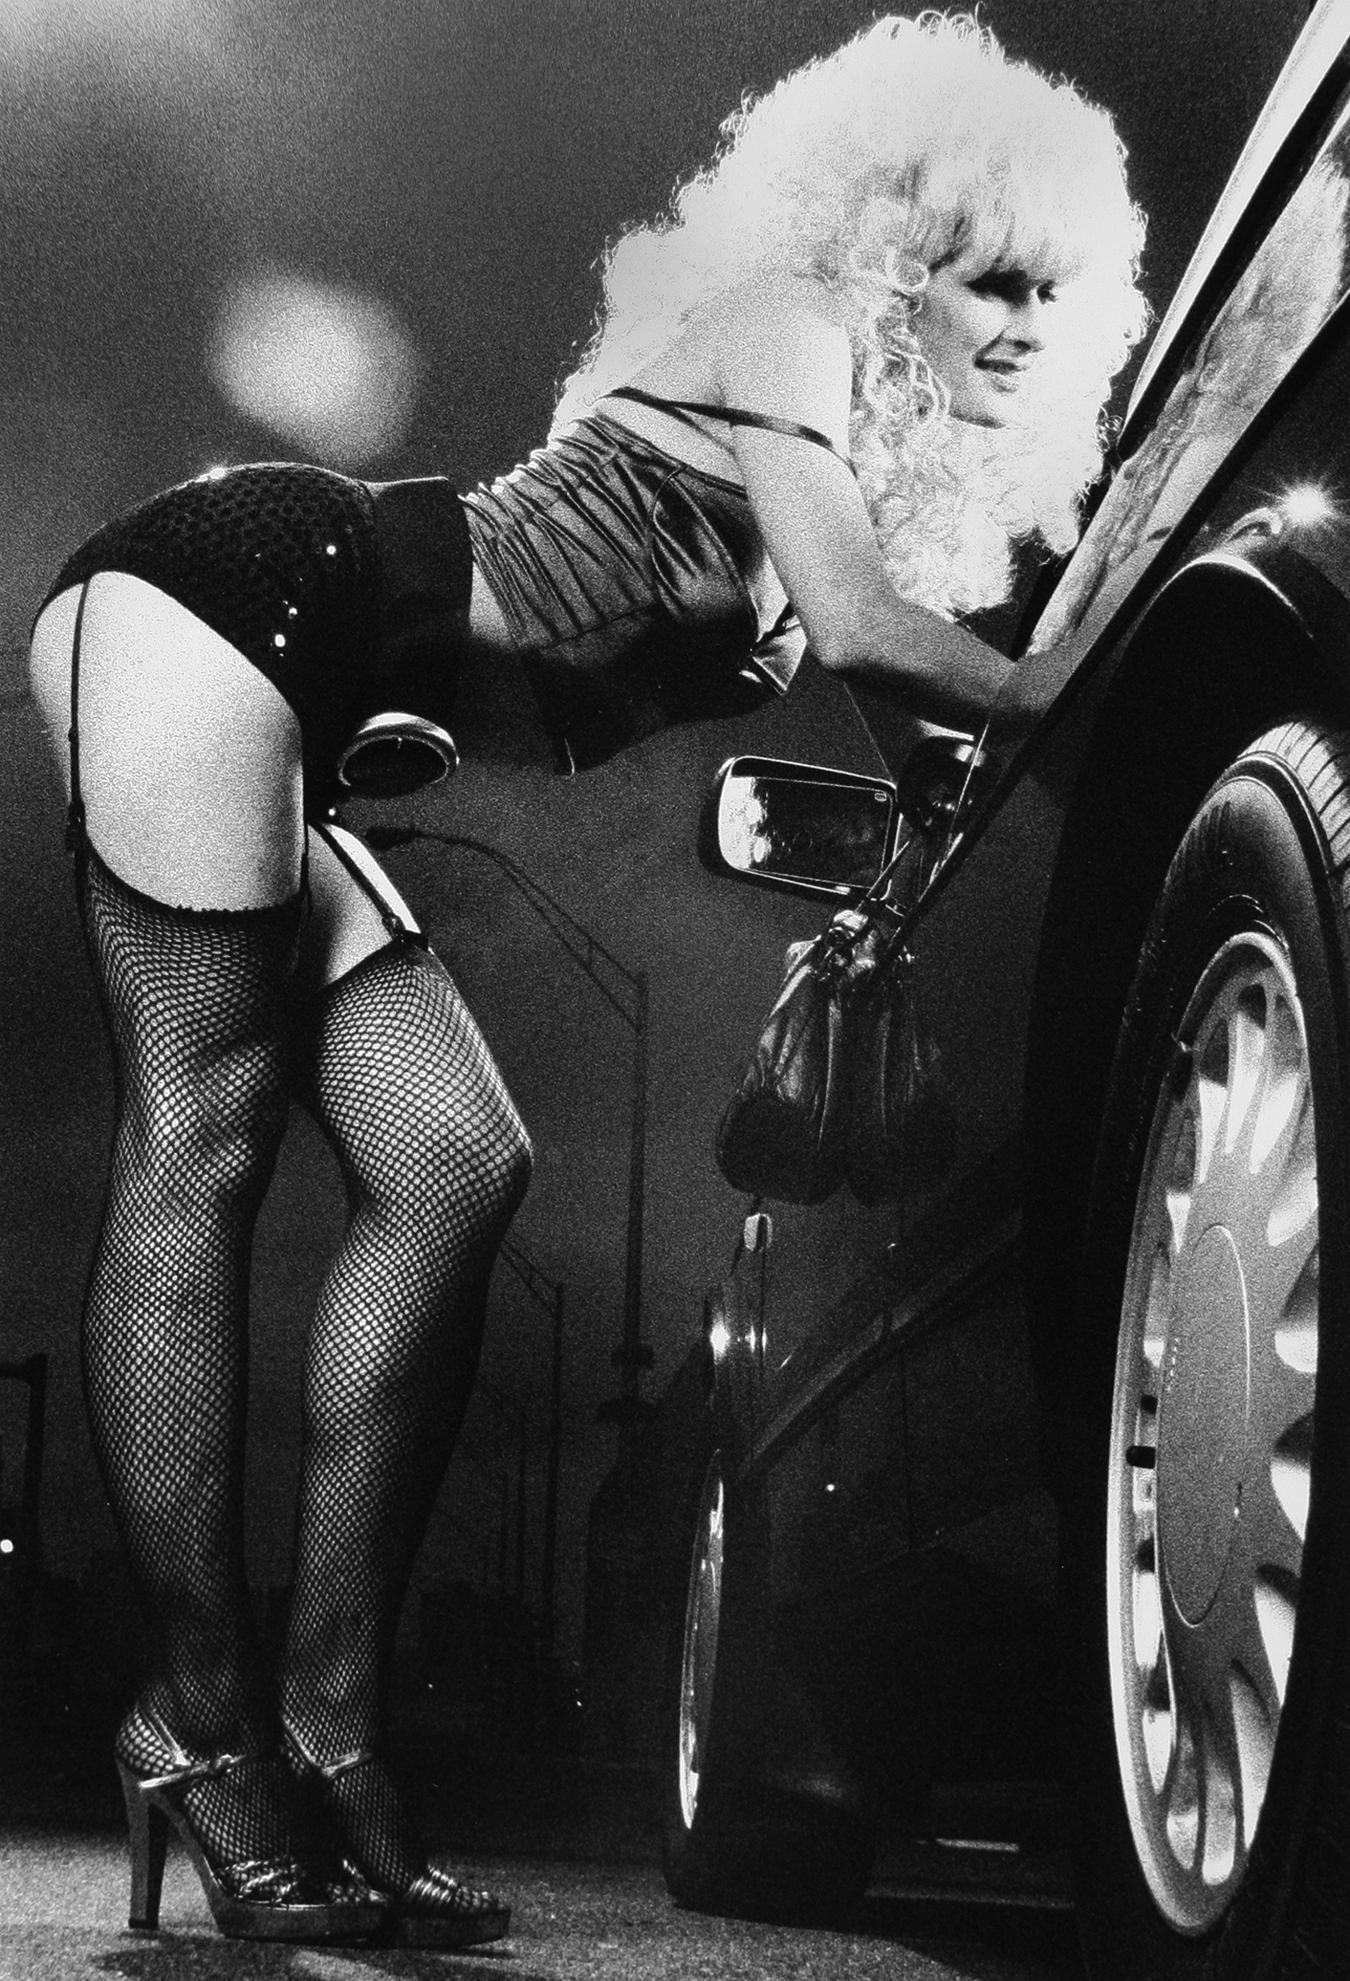 Tony_Ward_Studio_prostitution_Bob_Shell_article_nightlife